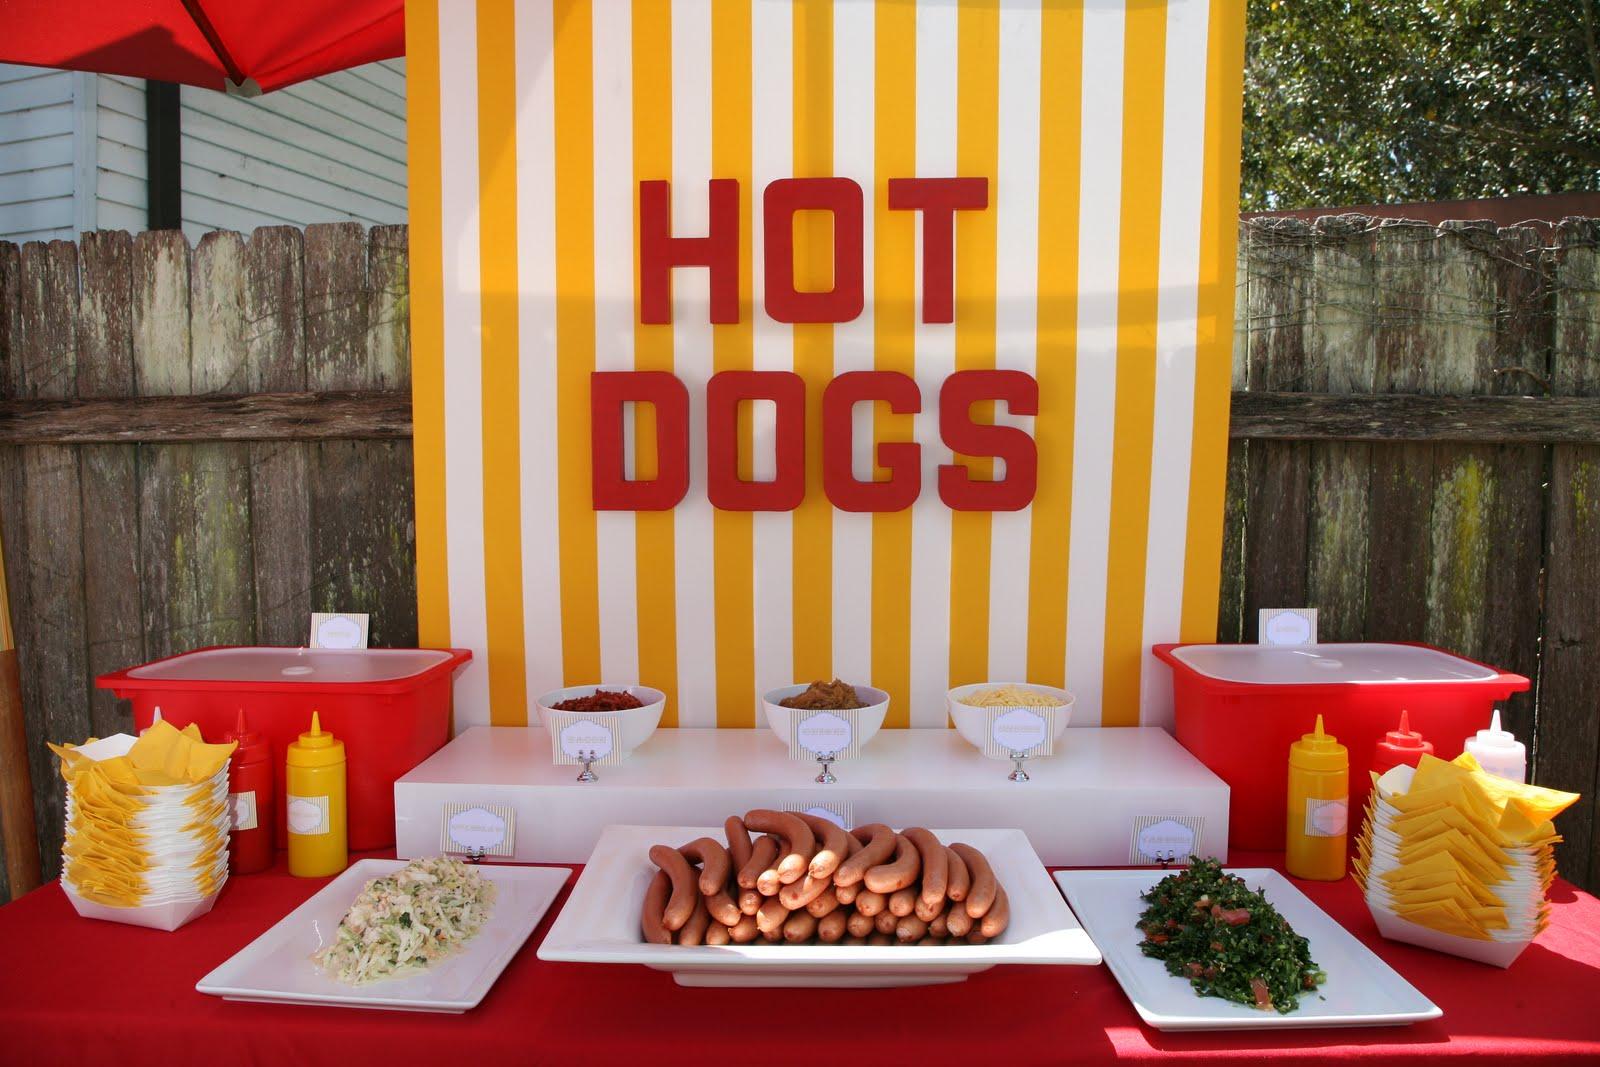 Hot dog stand, great way to make money